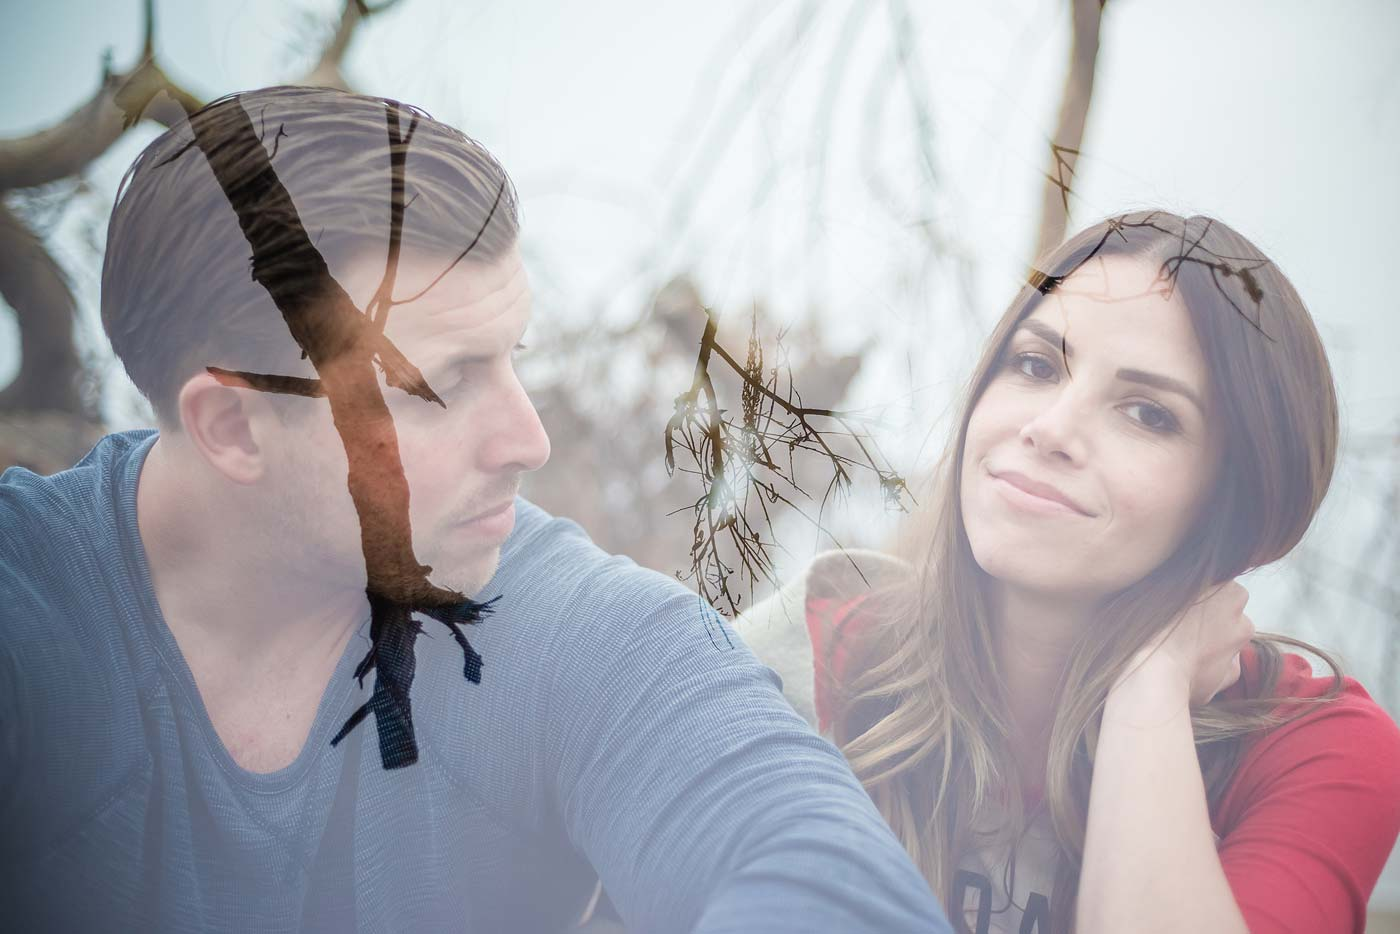 sMalibu-Date-with-Tiffany-and-Nate-412.jpg